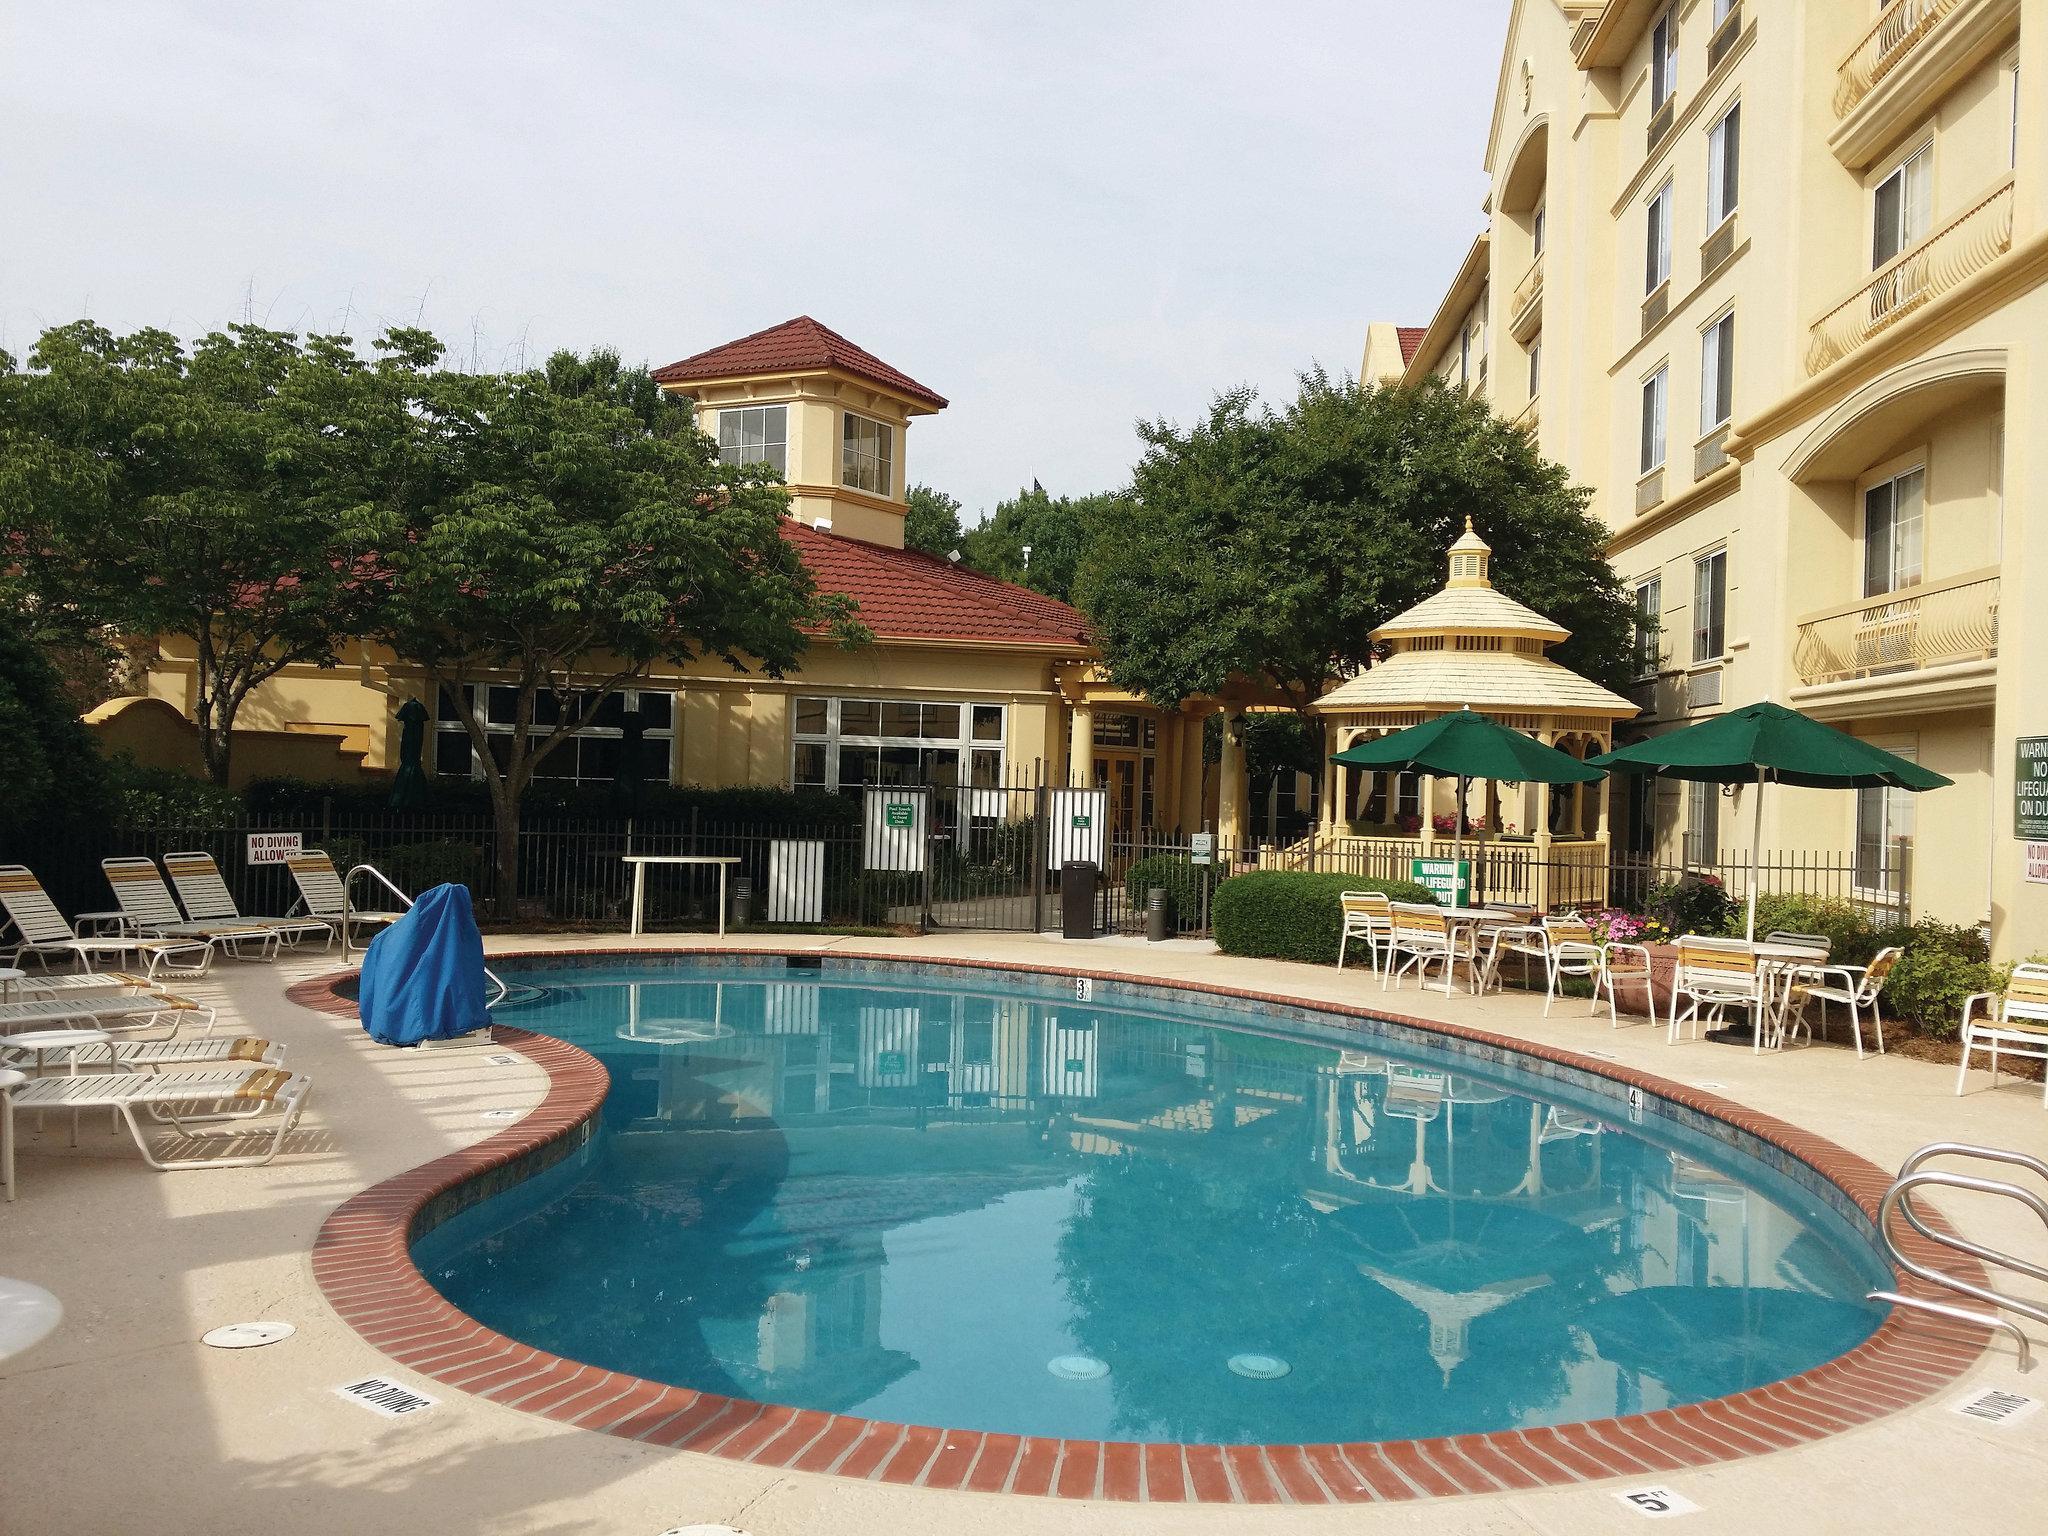 La Quinta Inn & Suites Raleigh Crabtree